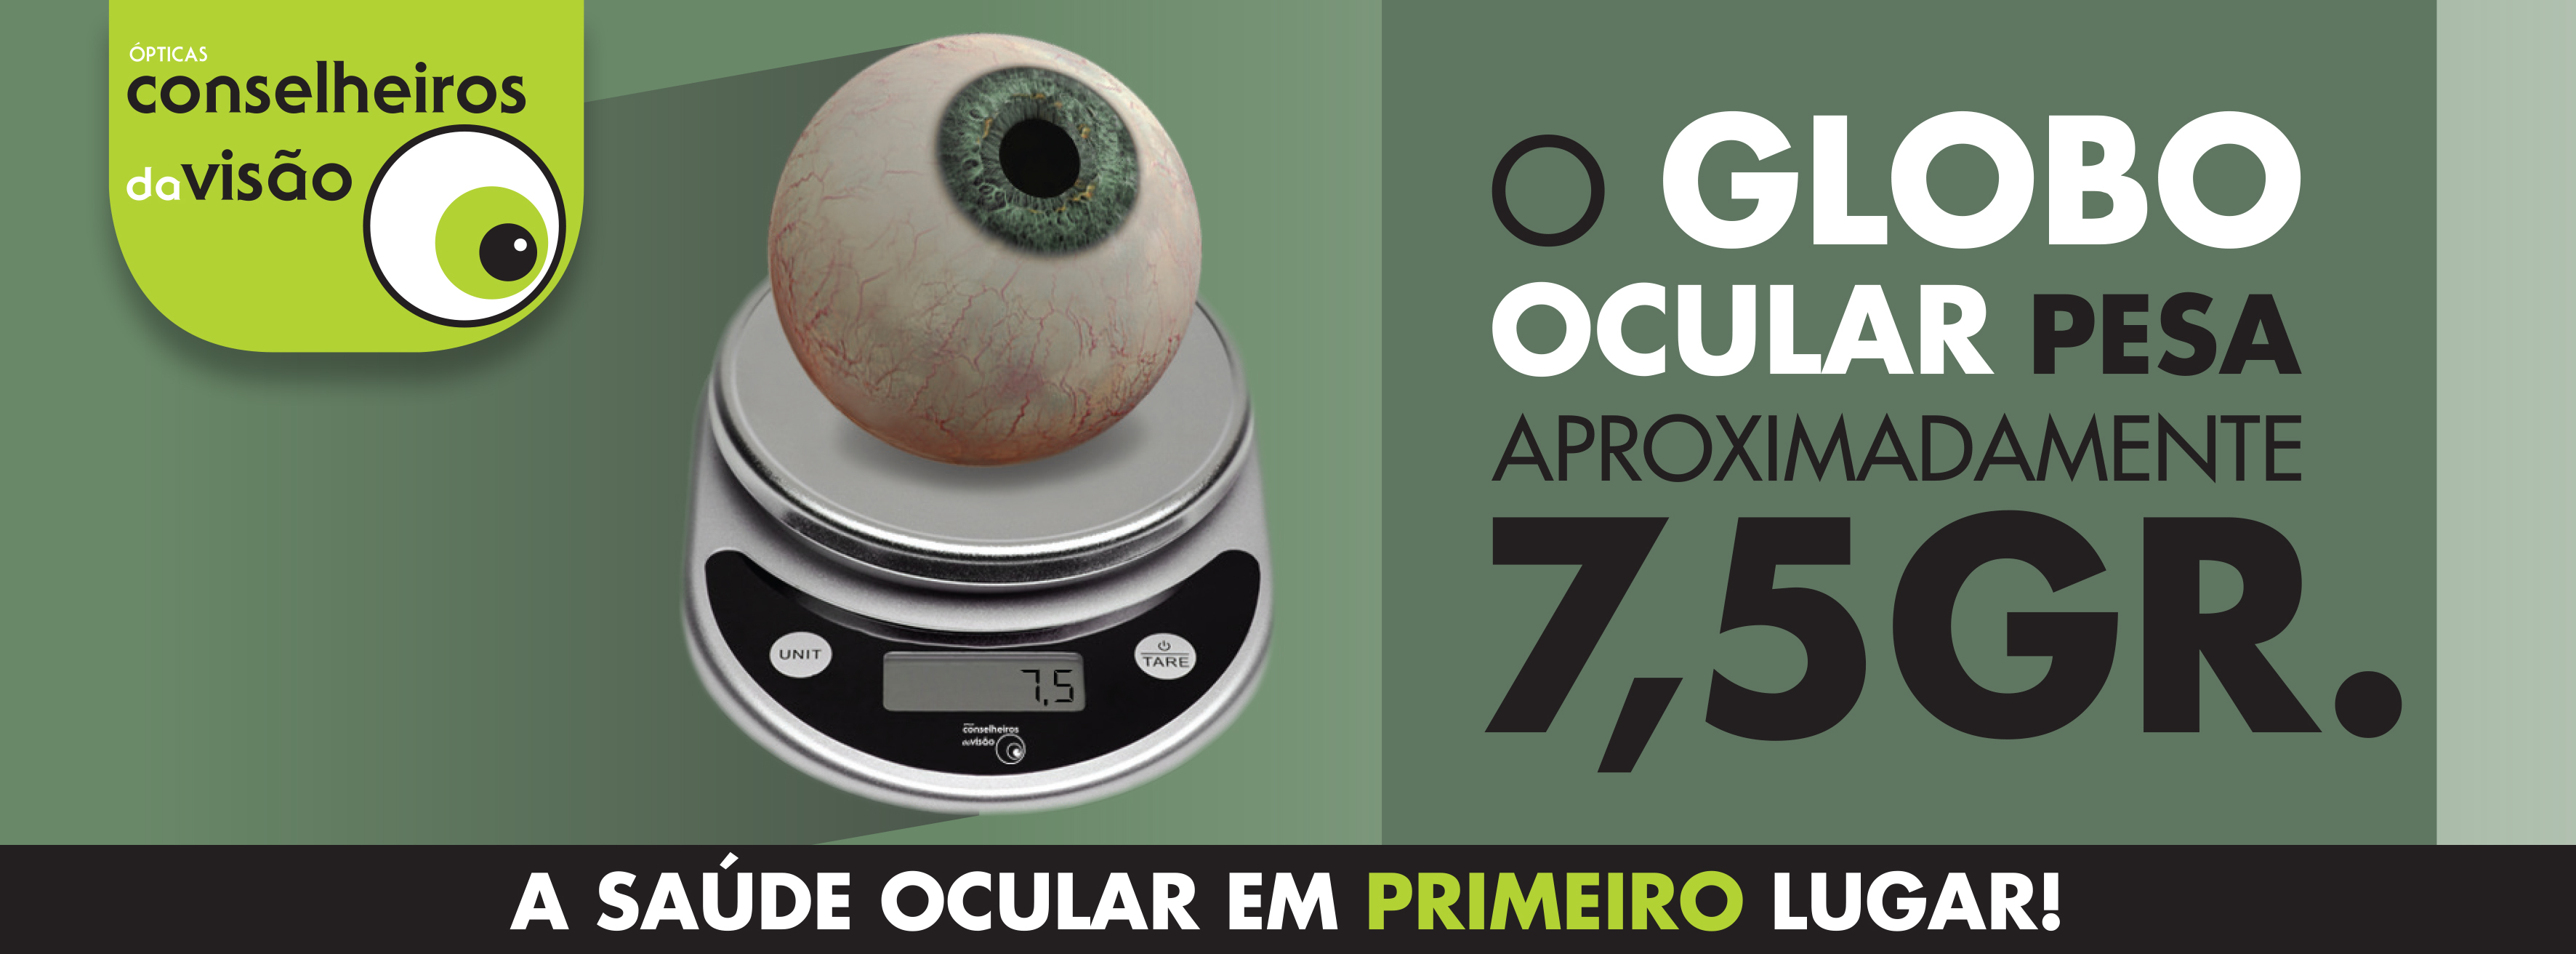 DICA_FACE_globo_ocular_pesa_v1